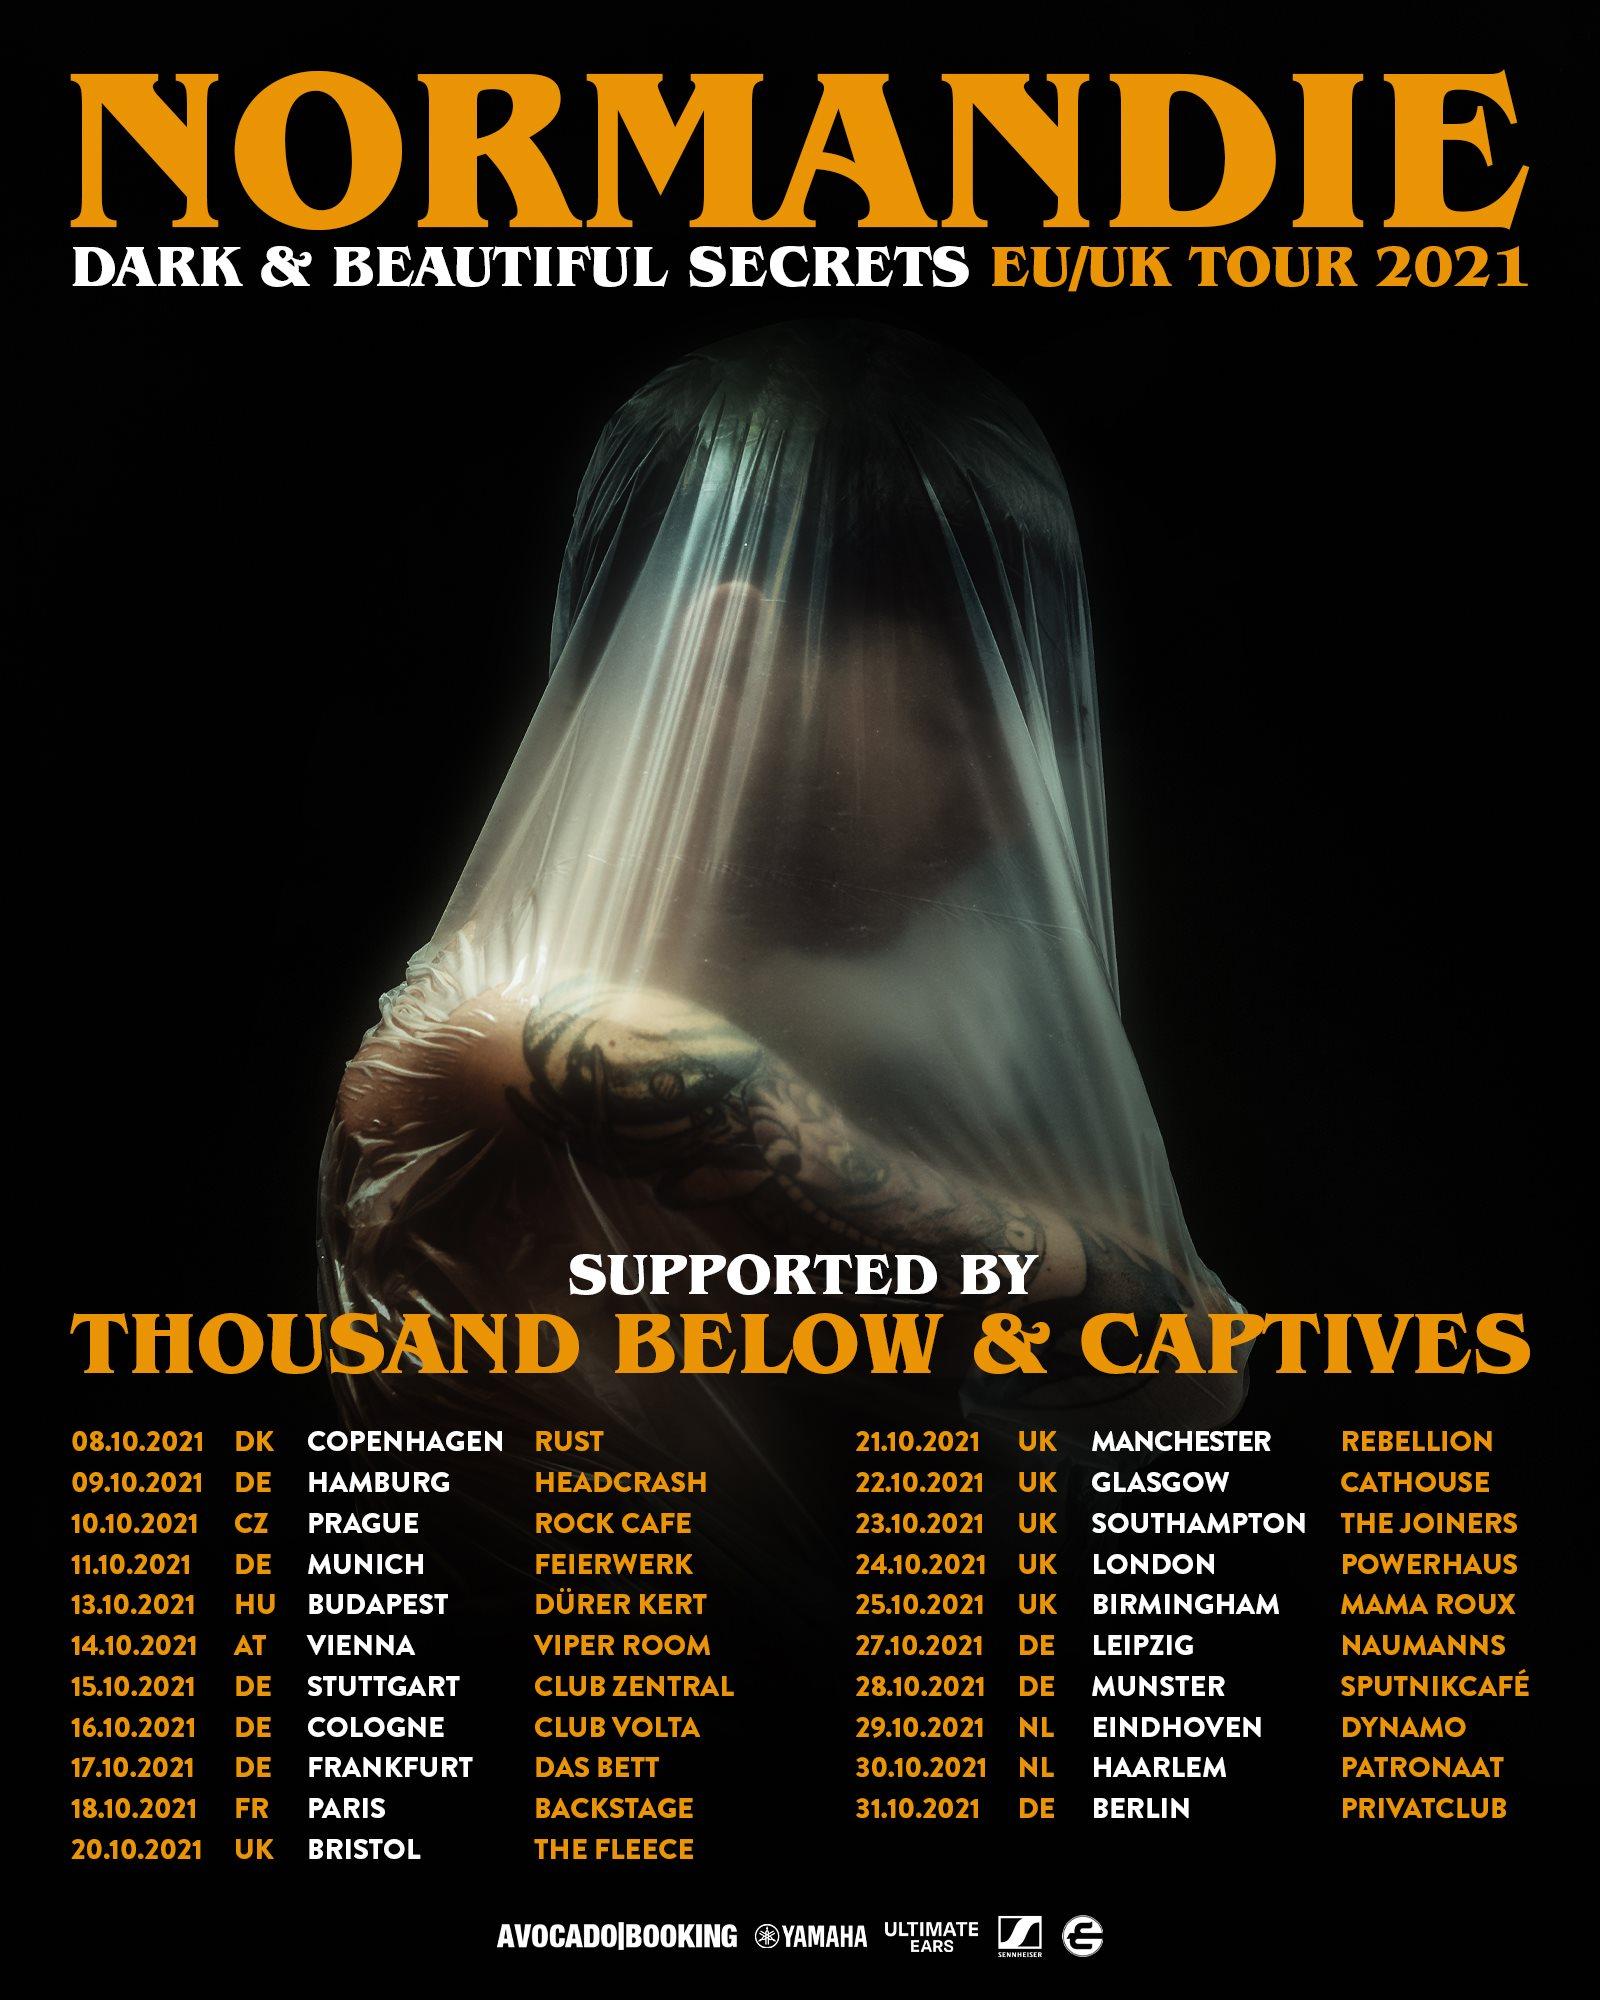 Normandie - Tour Dates 2021